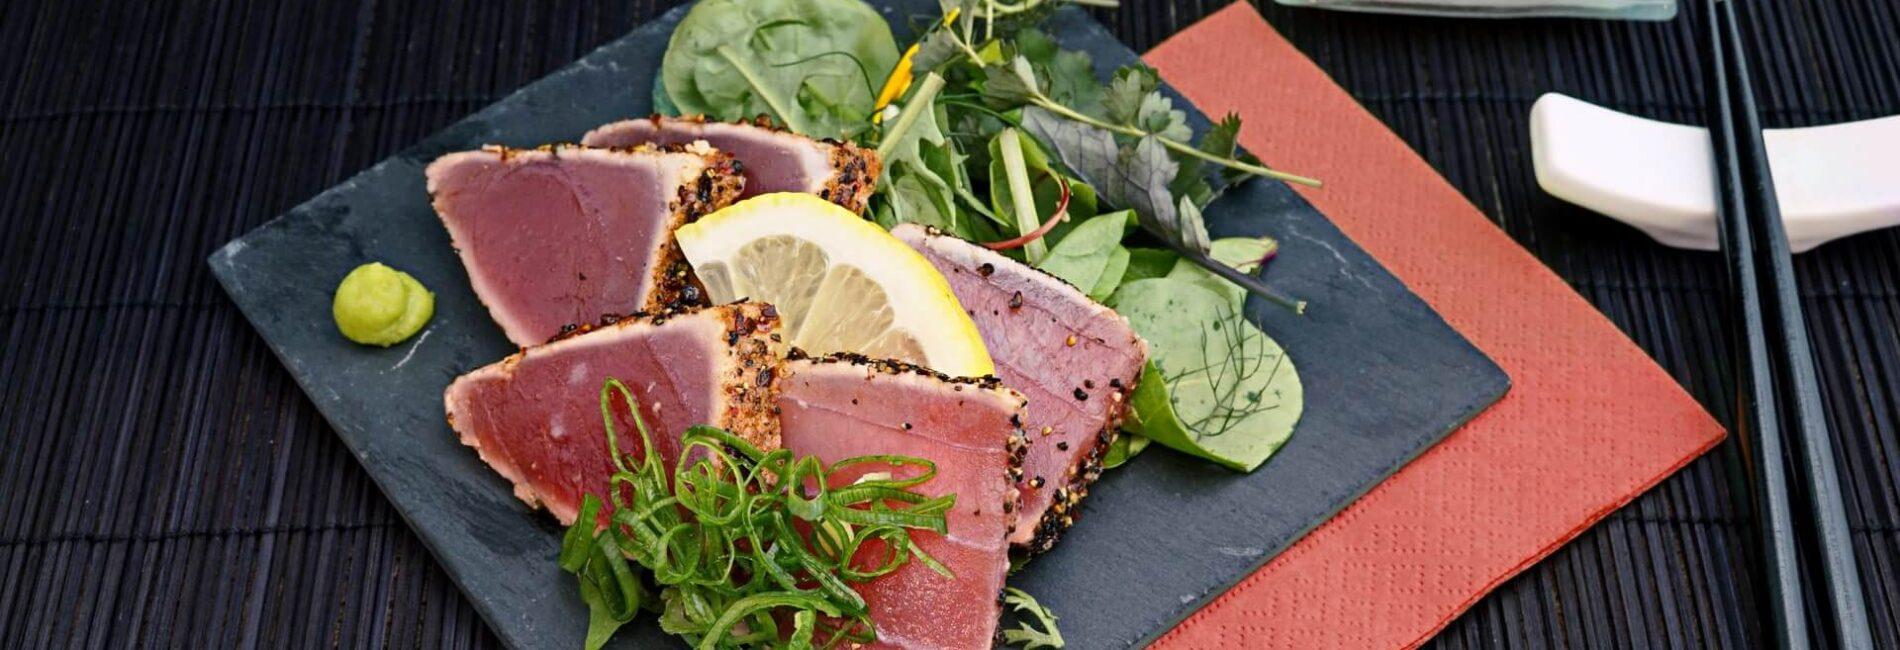 Tuna Cakes with Dill Sauce